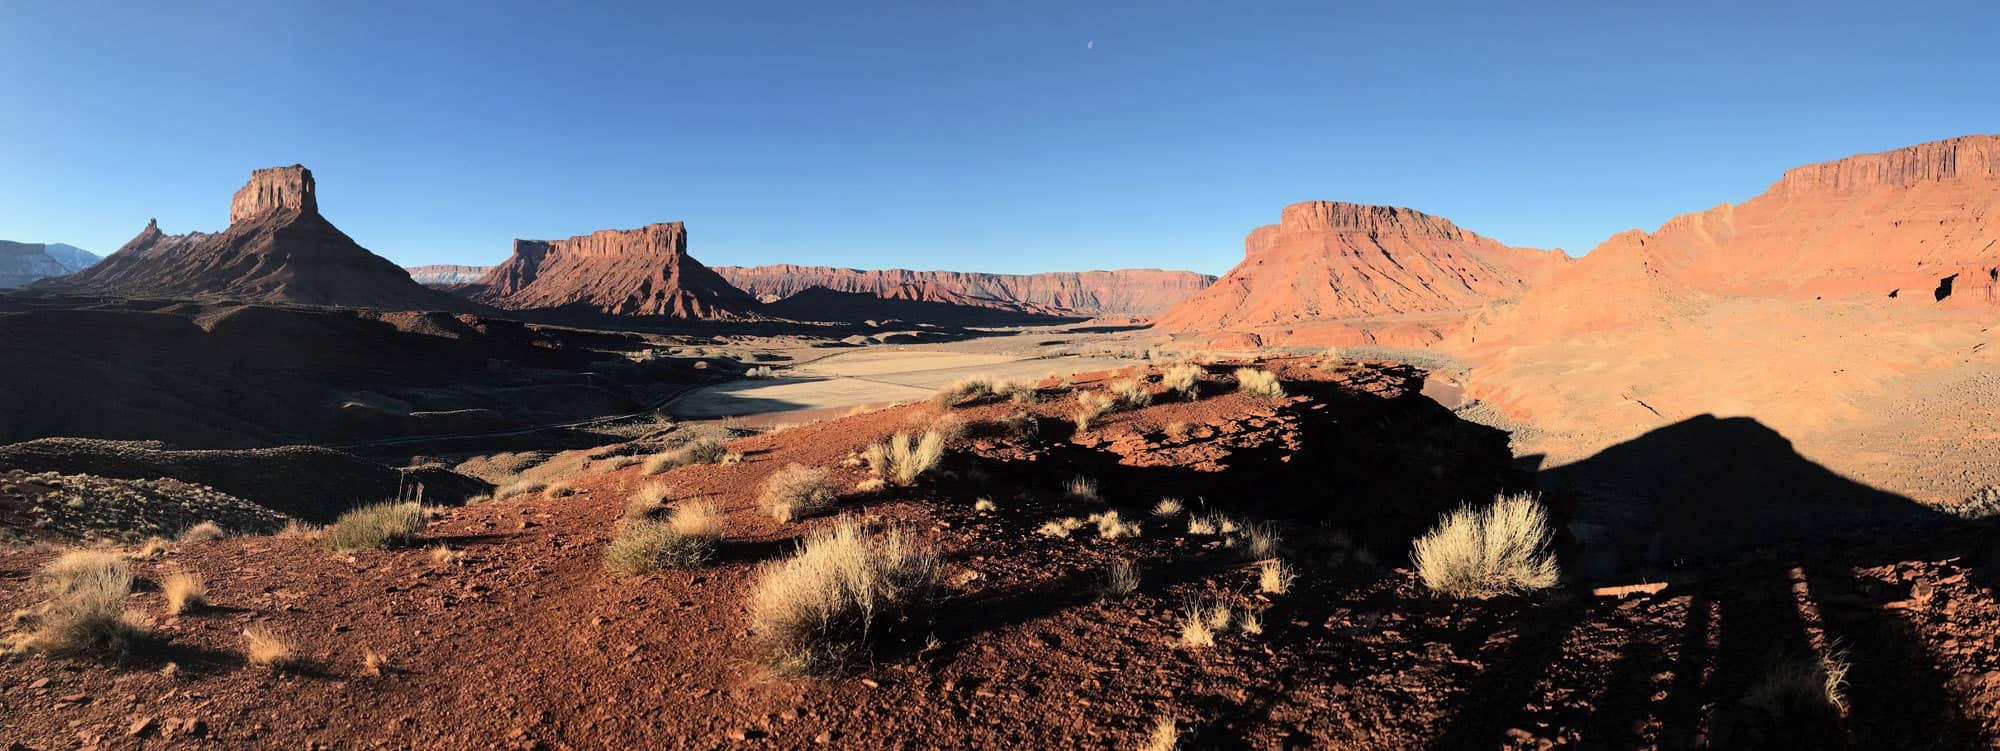 desert-canyons